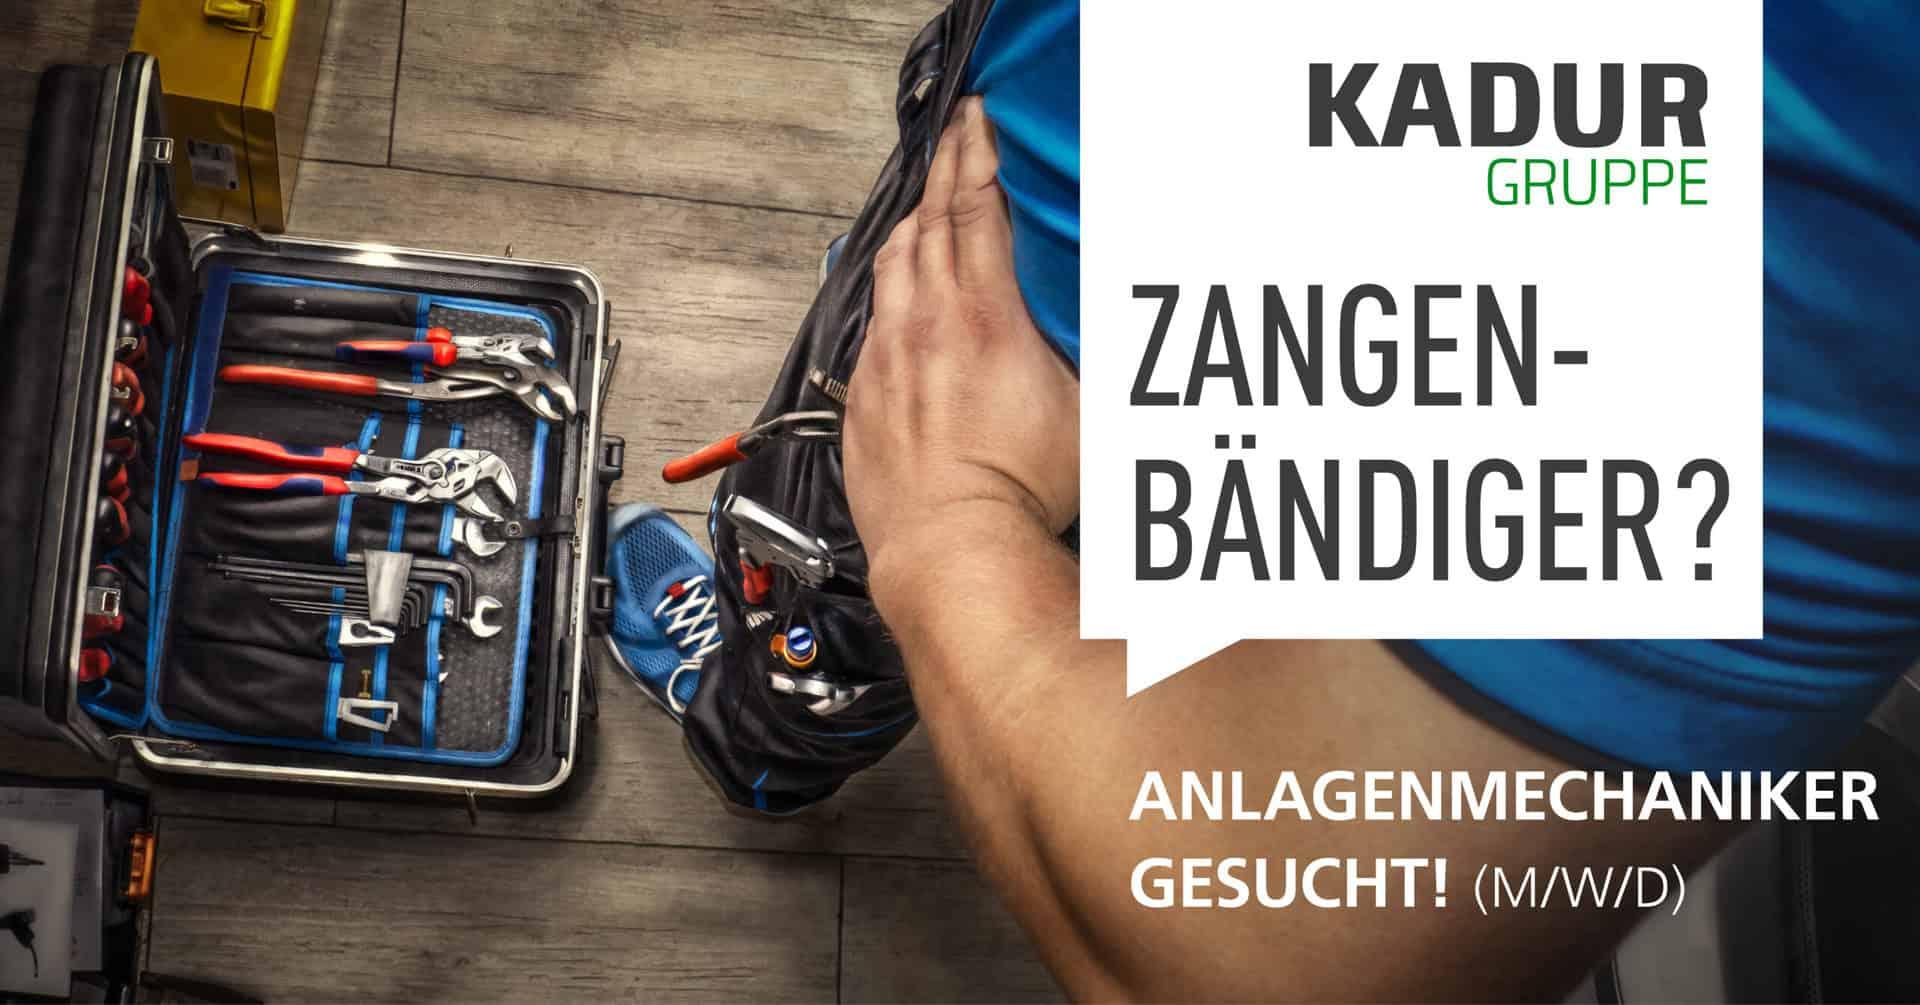 KADUR Gruppe Anlagenmechaniker gesucht Dresden